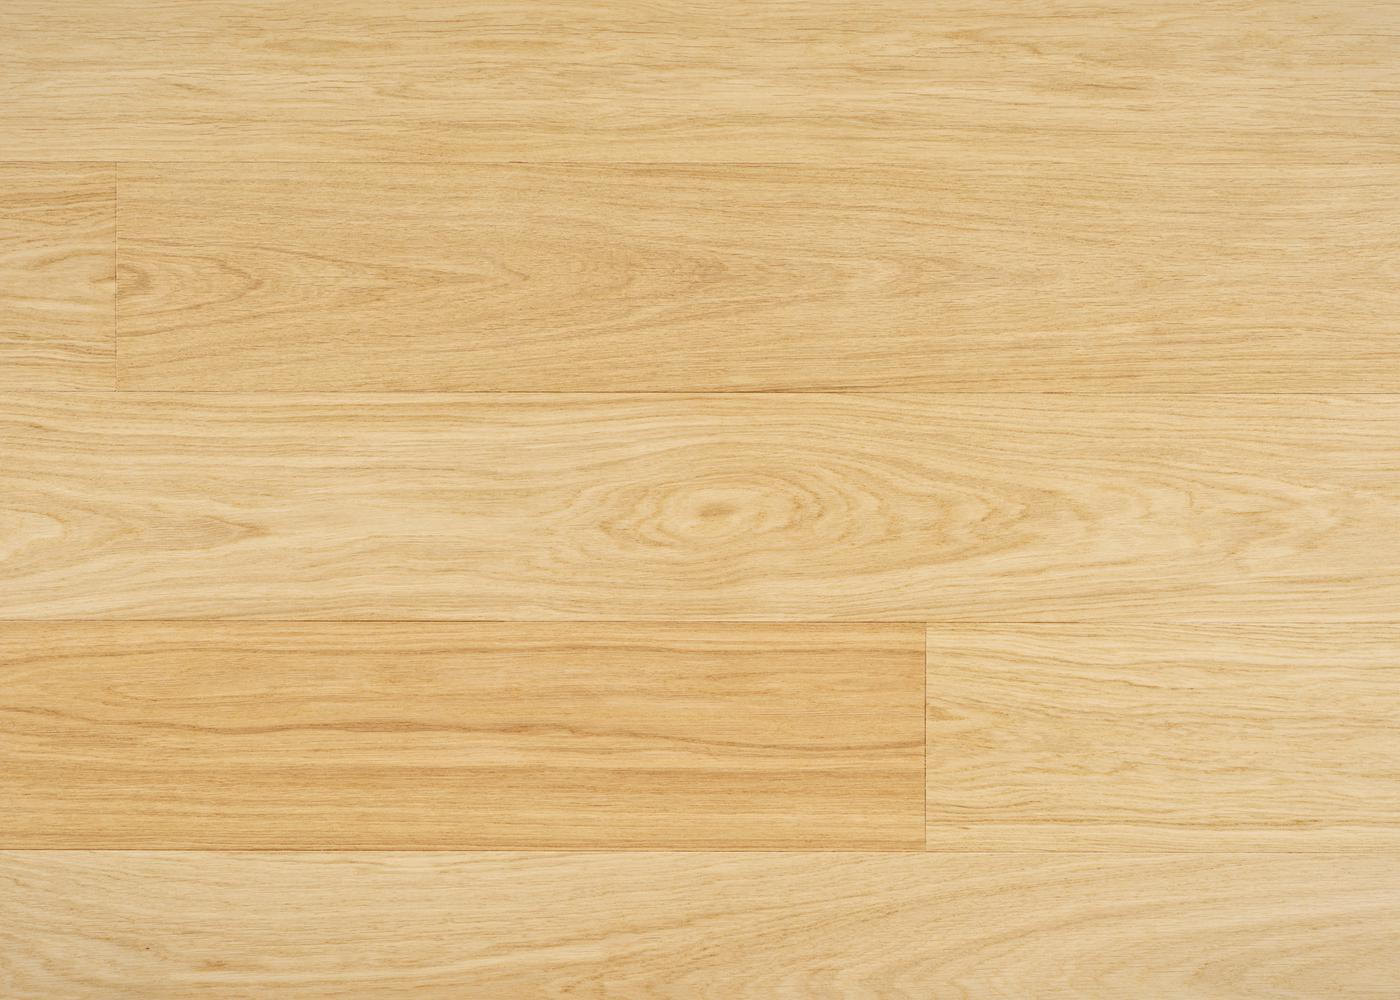 Parquet chêne contrecollé SOLENZARA brossé vernis mat Select support HDF 10x92x1420